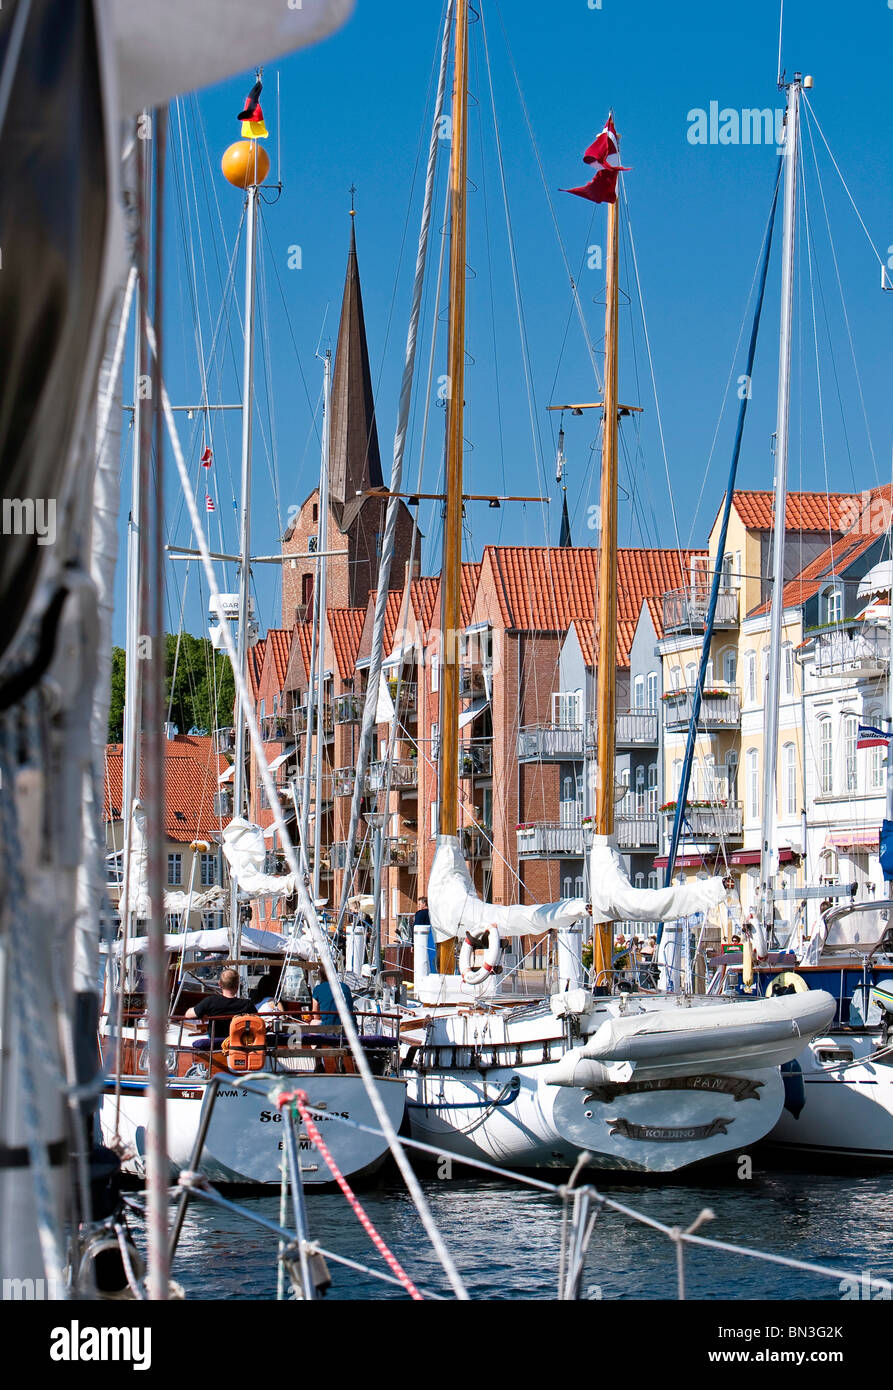 Sailing ships in harbour, Sonderburg, Denmark, Europe - Stock Image